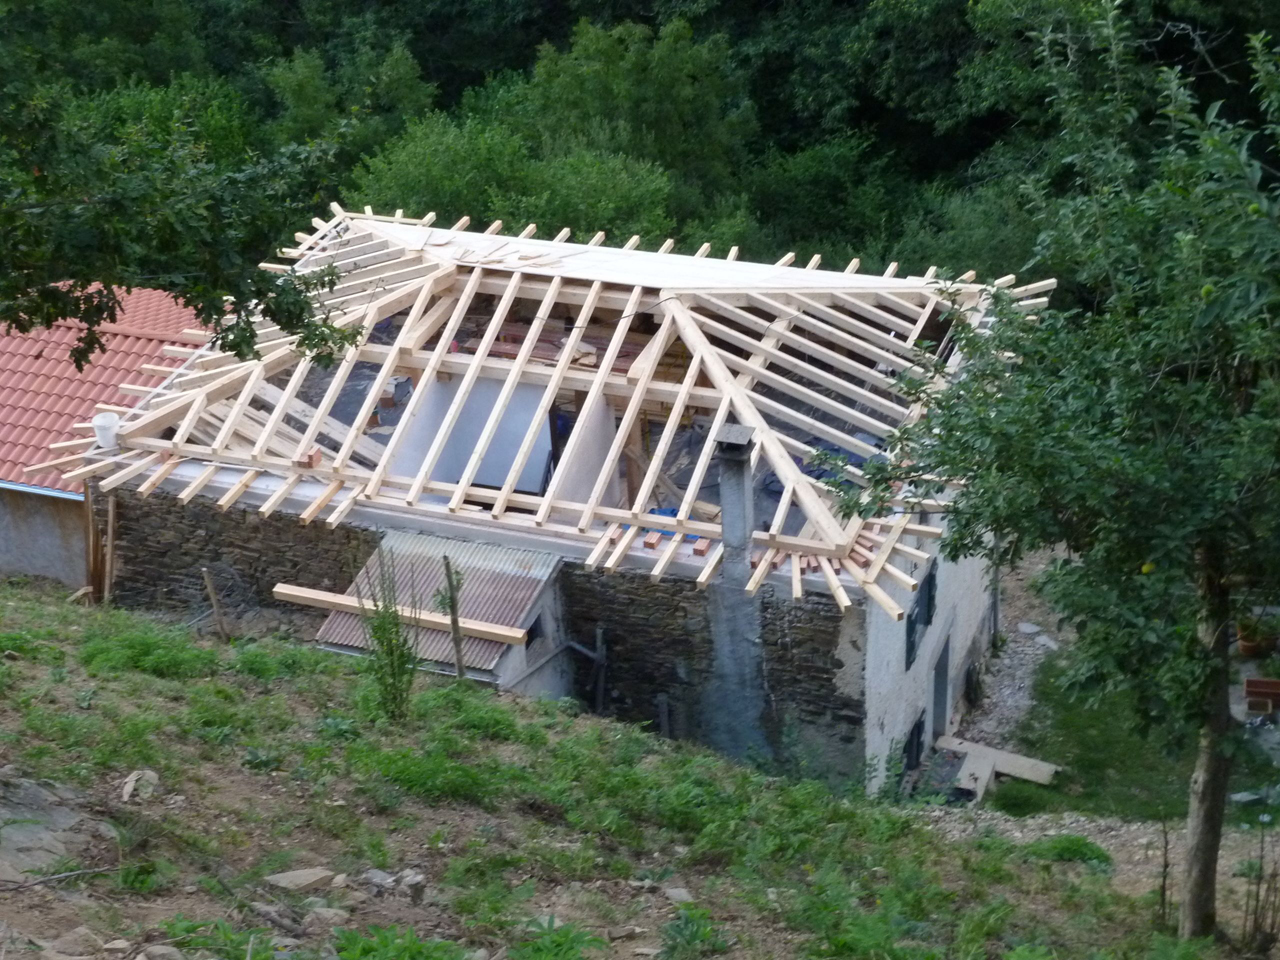 tejado cuatro aguas carpinter a de armar foromadera